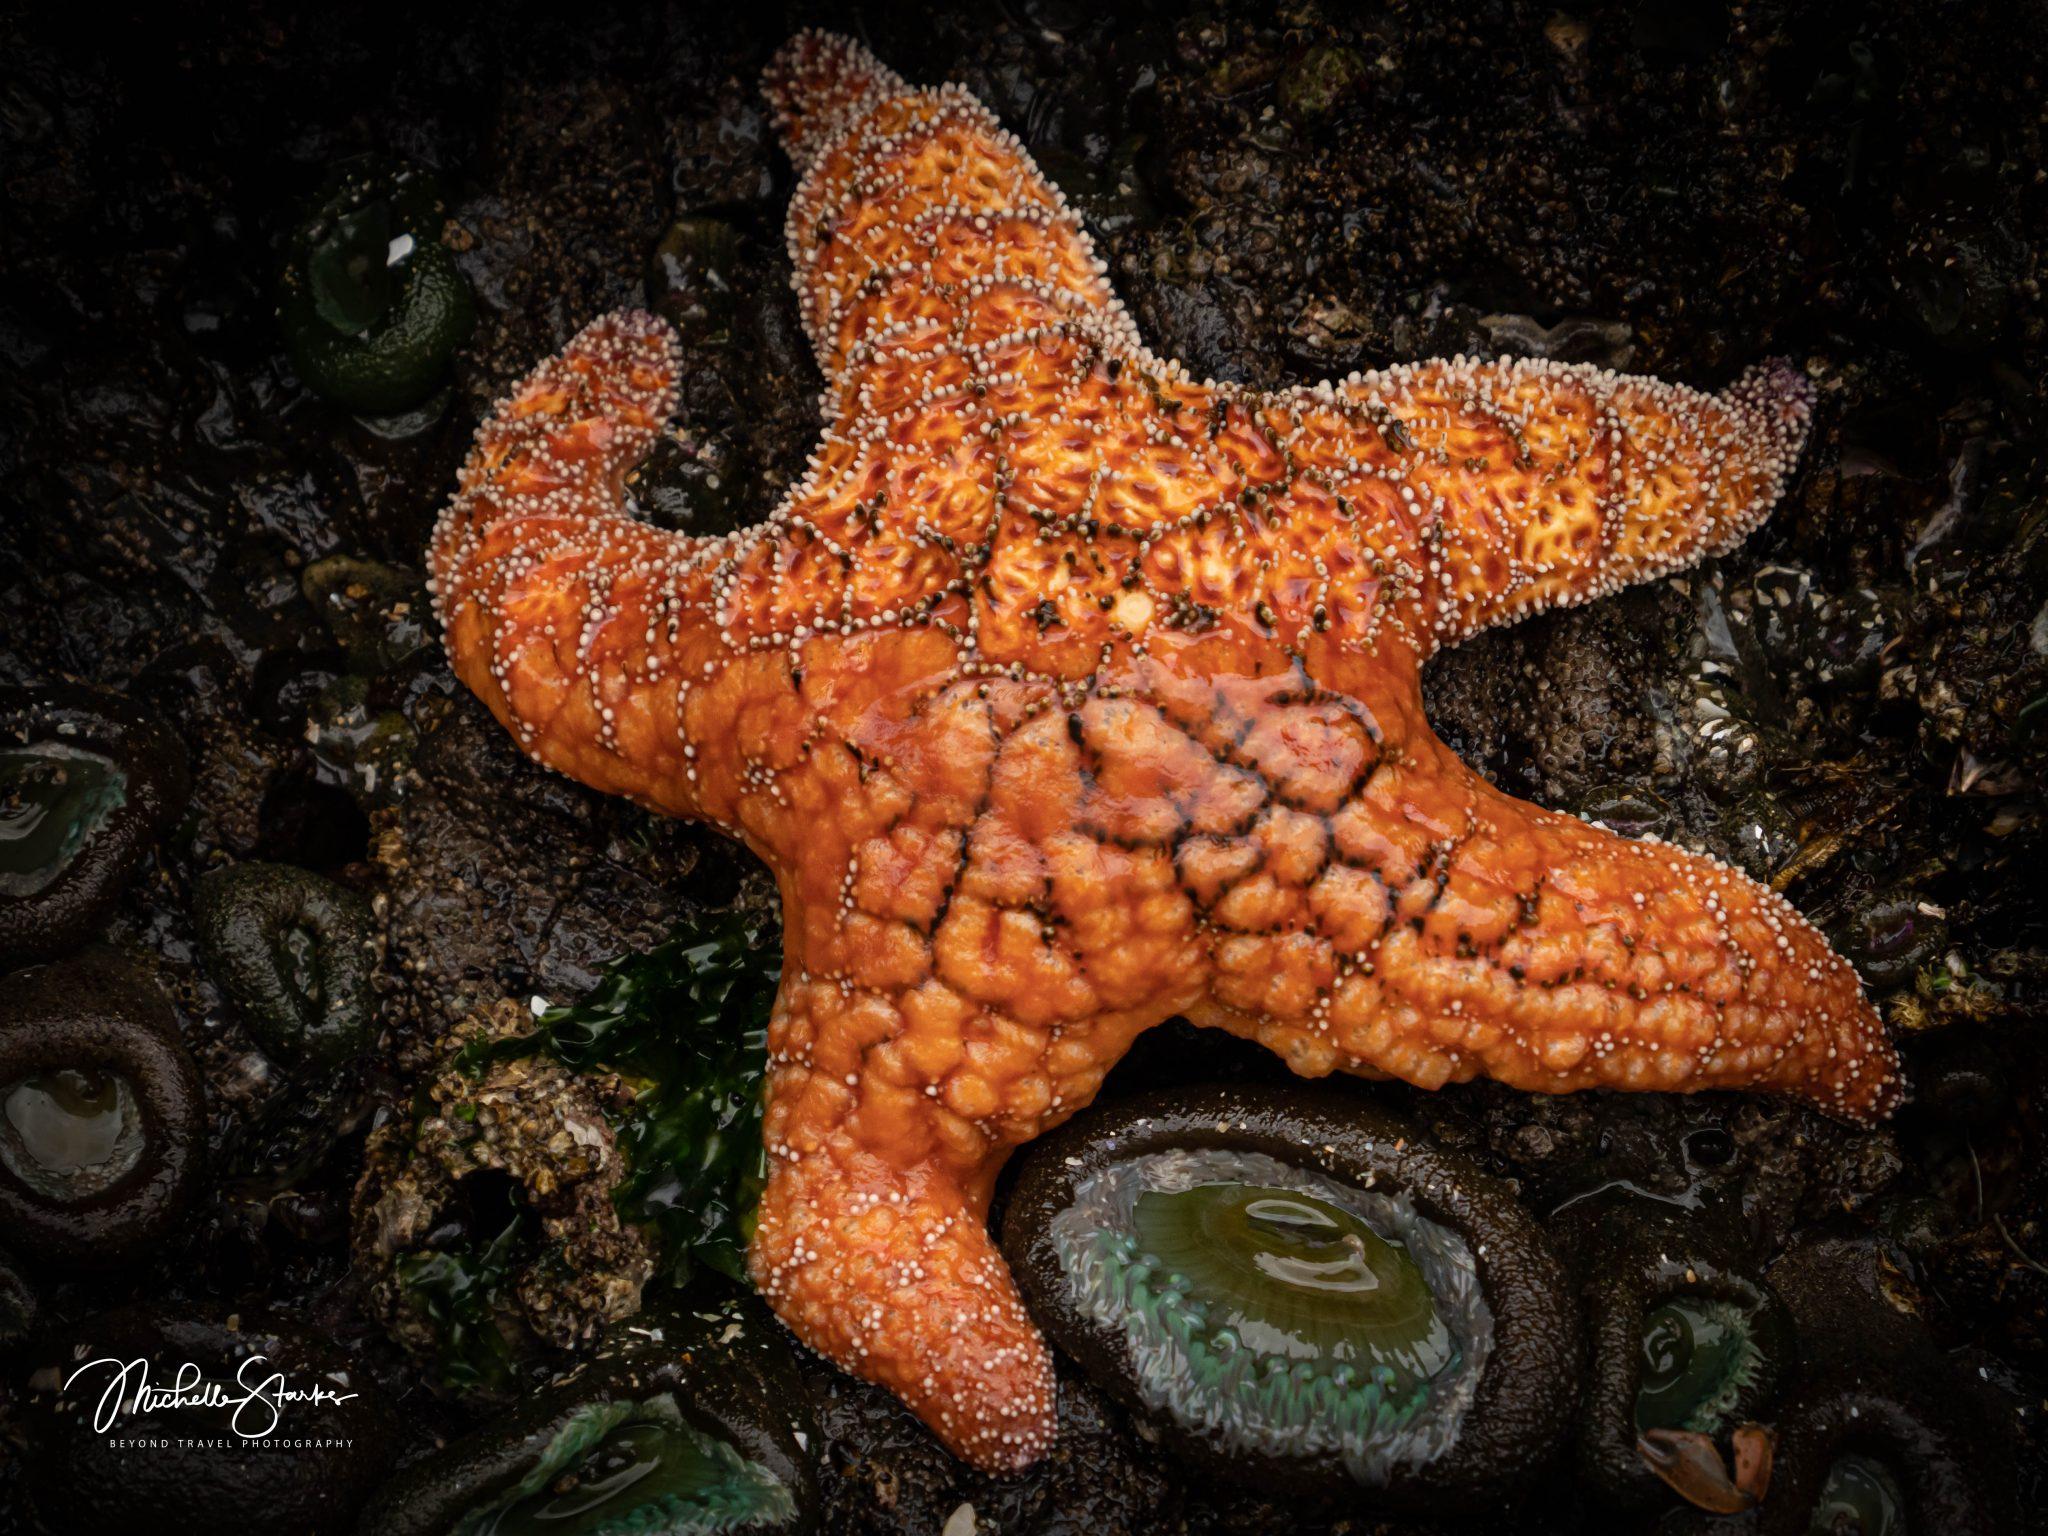 Sea Star, Cannon Beach, OR 7/24/20